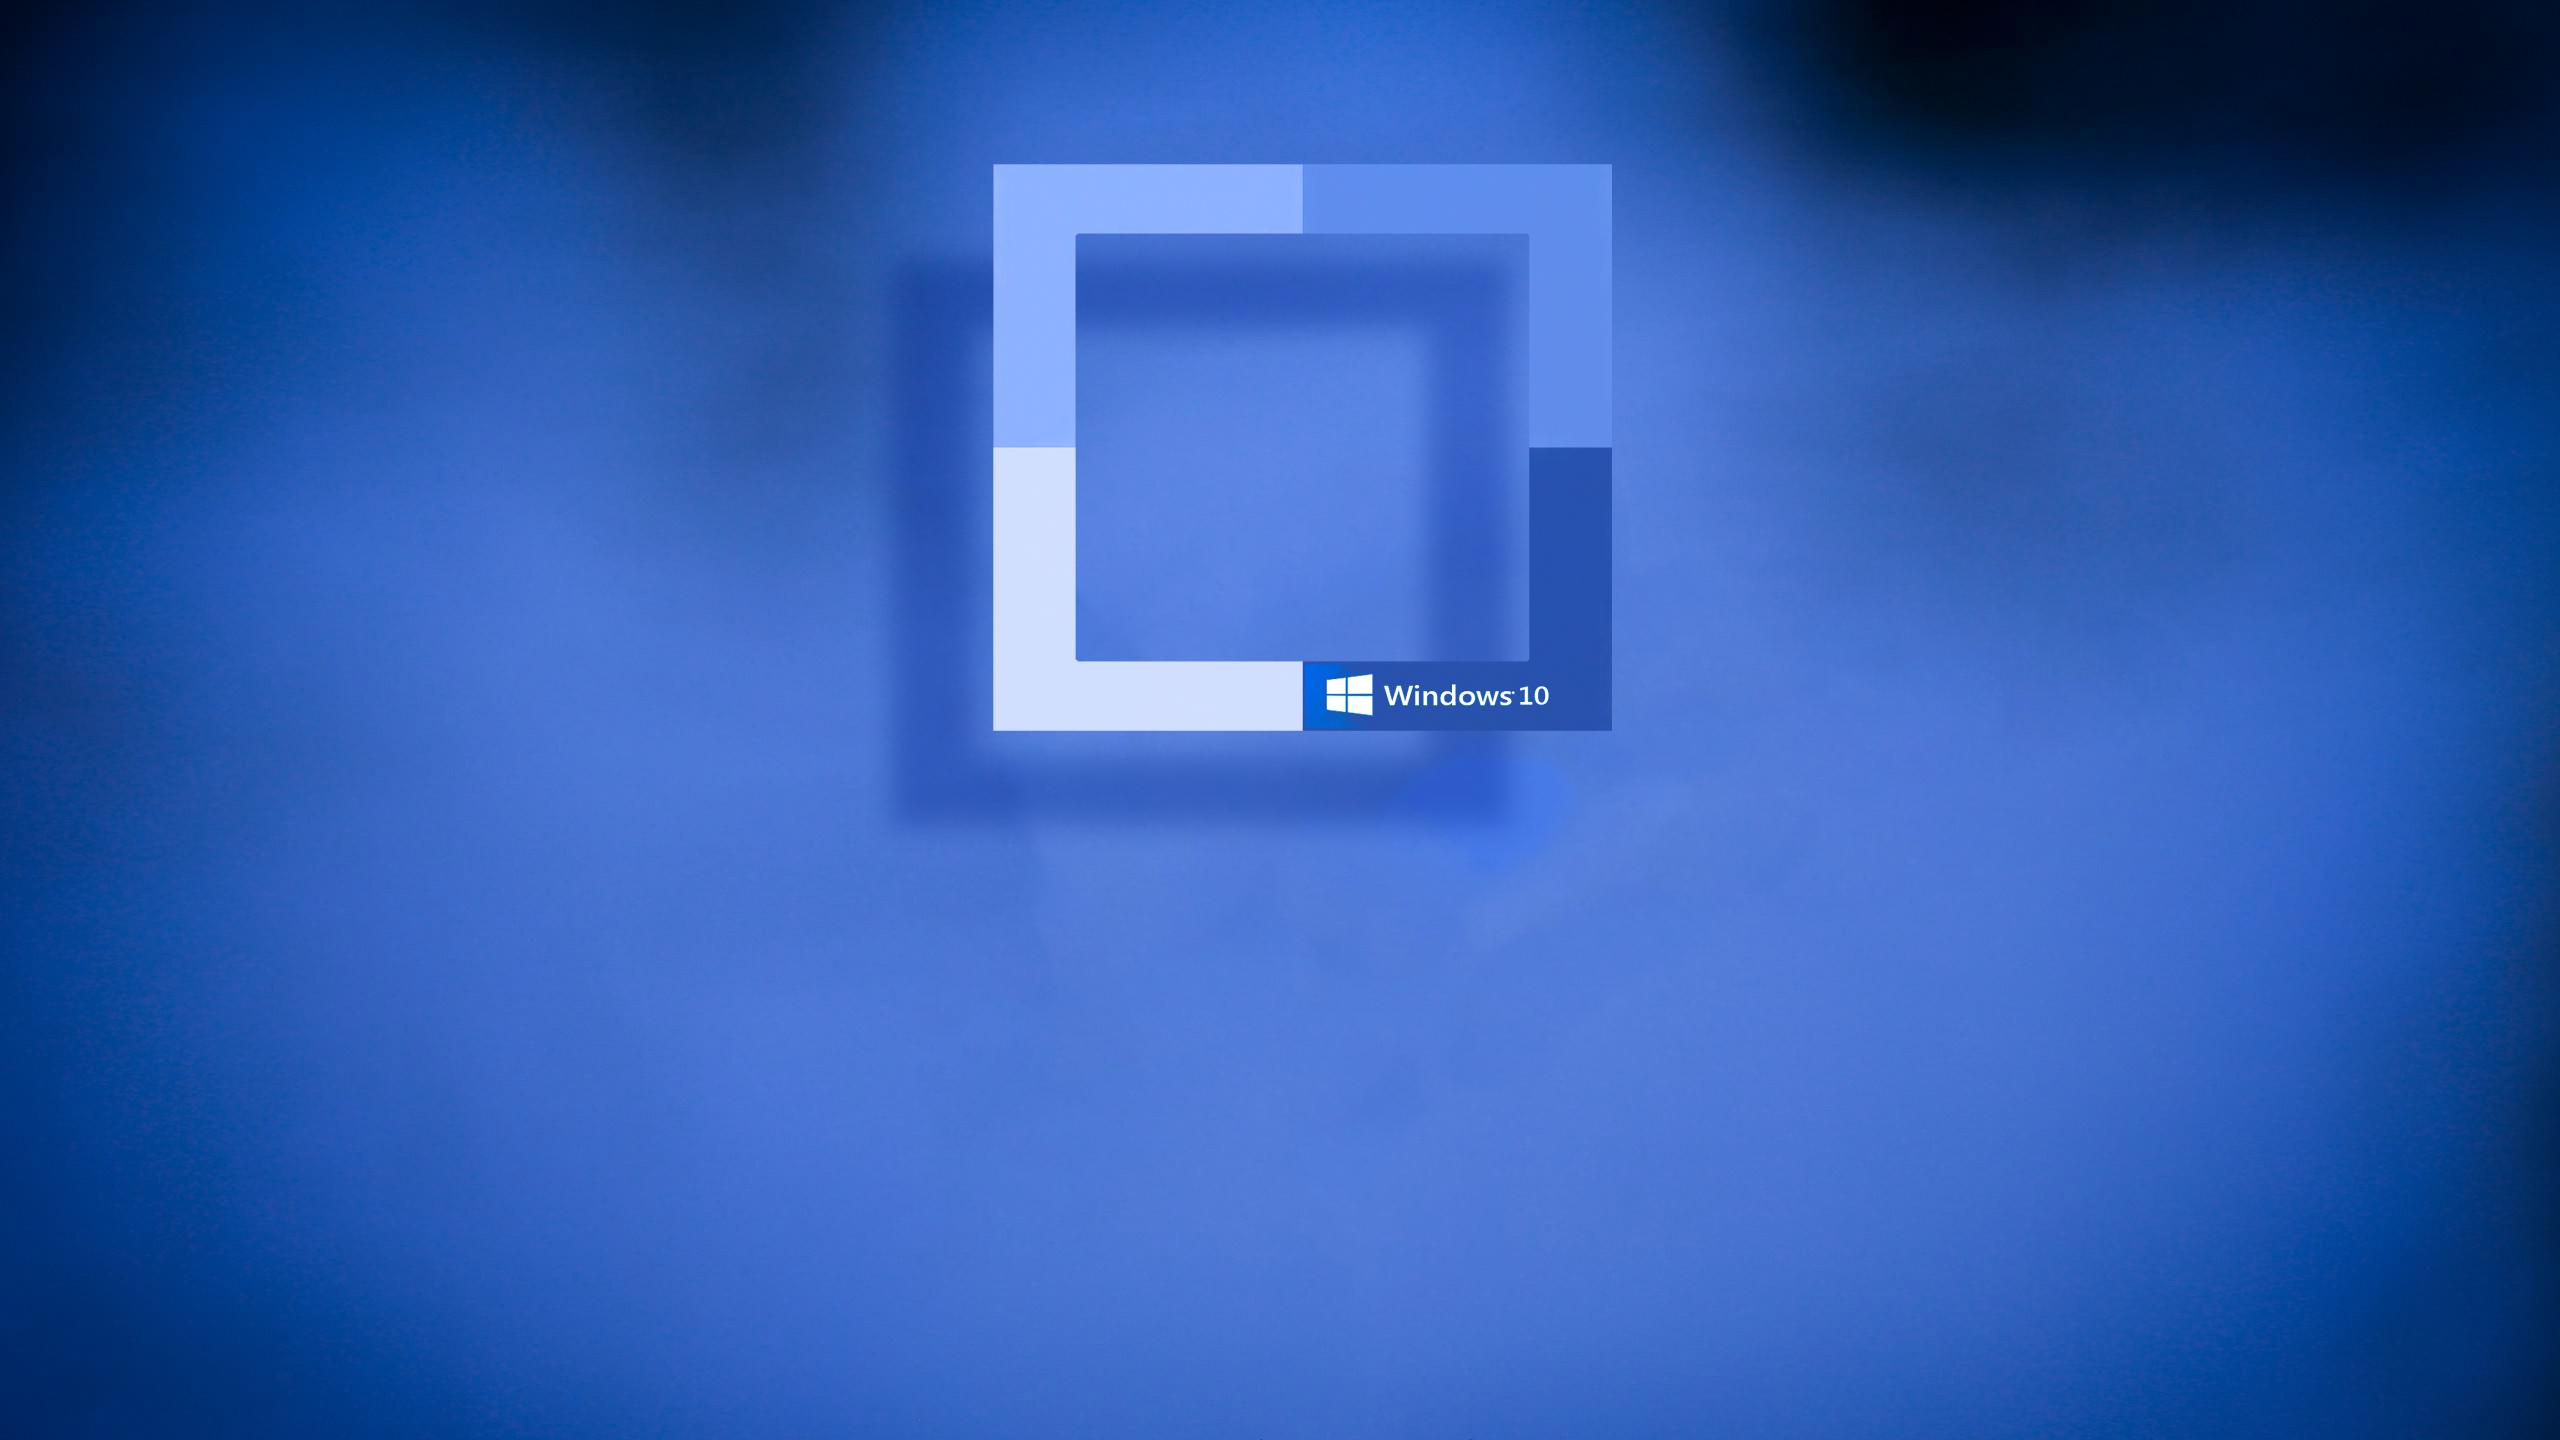 43] Windows 10 Backgrounds and Wallpaper on WallpaperSafari 2560x1440